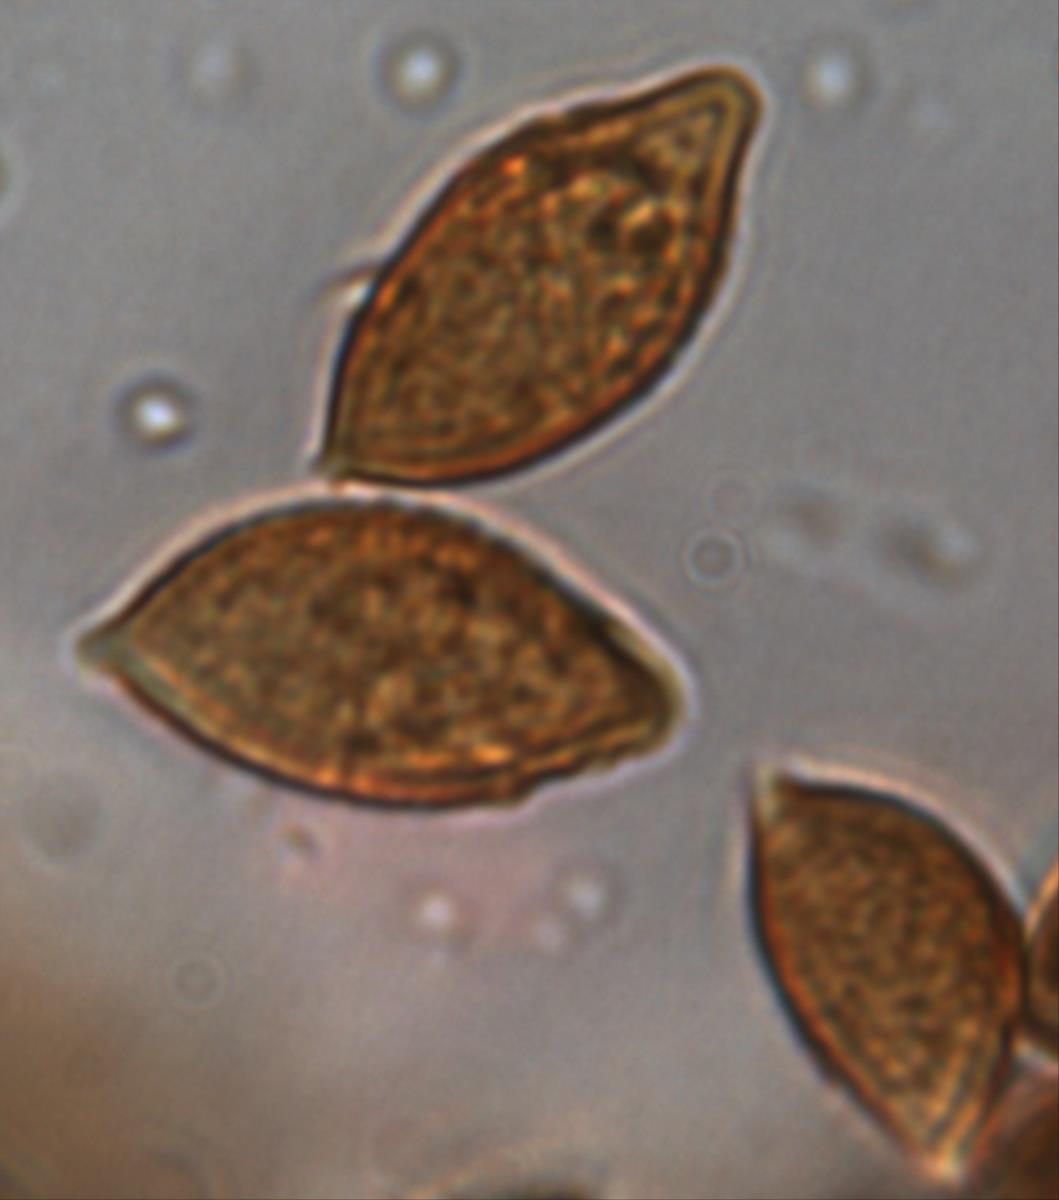 Setchelliogaster australiensis image